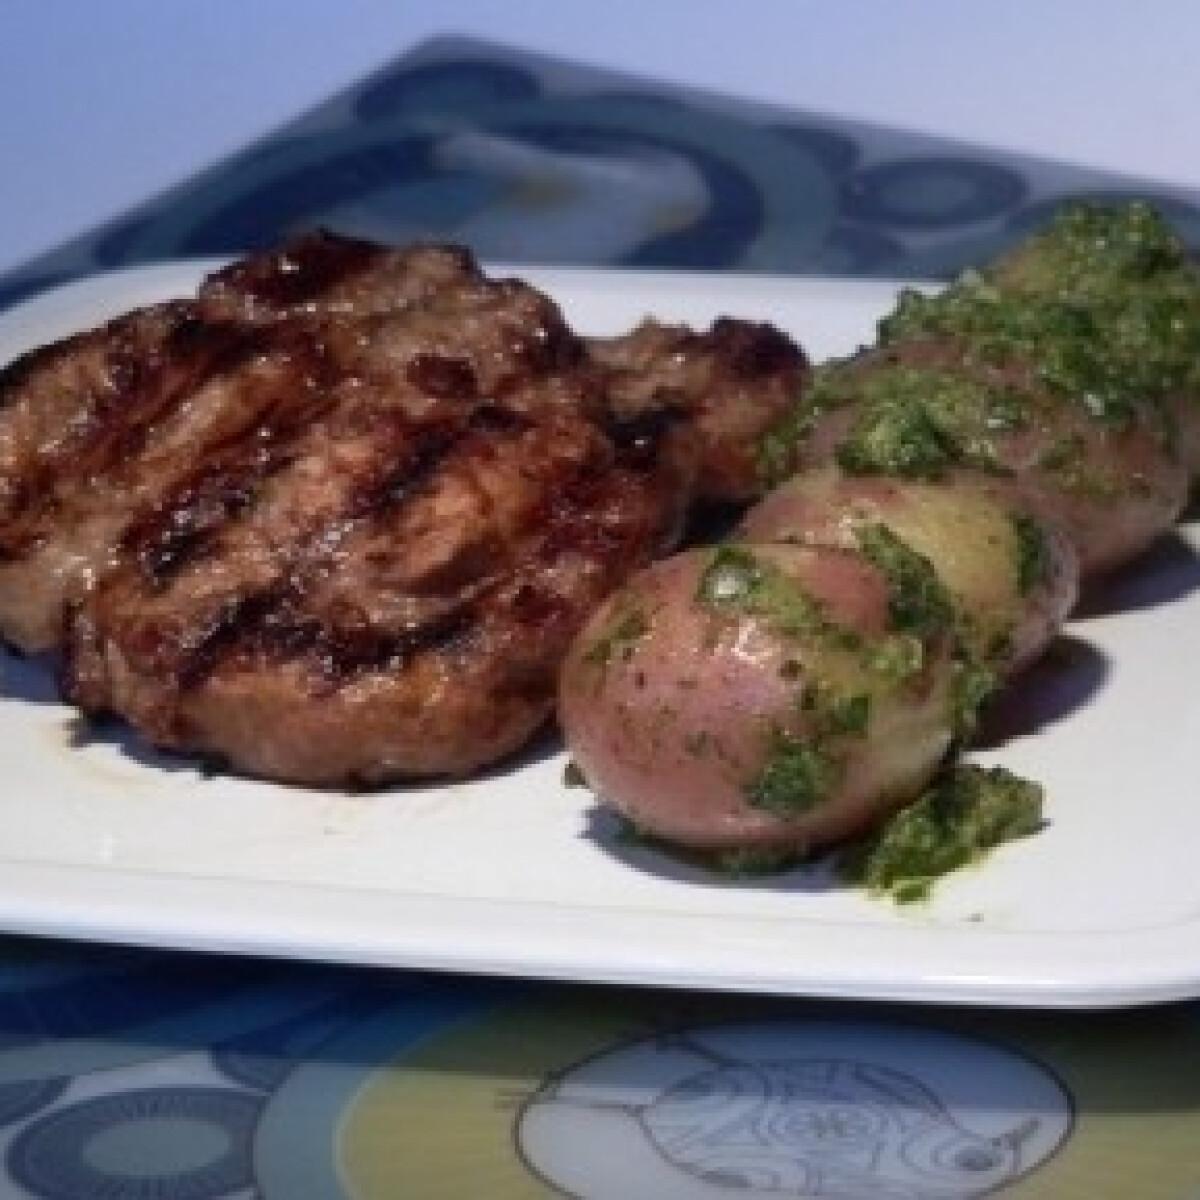 Szerecsendiós-chilis hús salsa verde-s krumplival